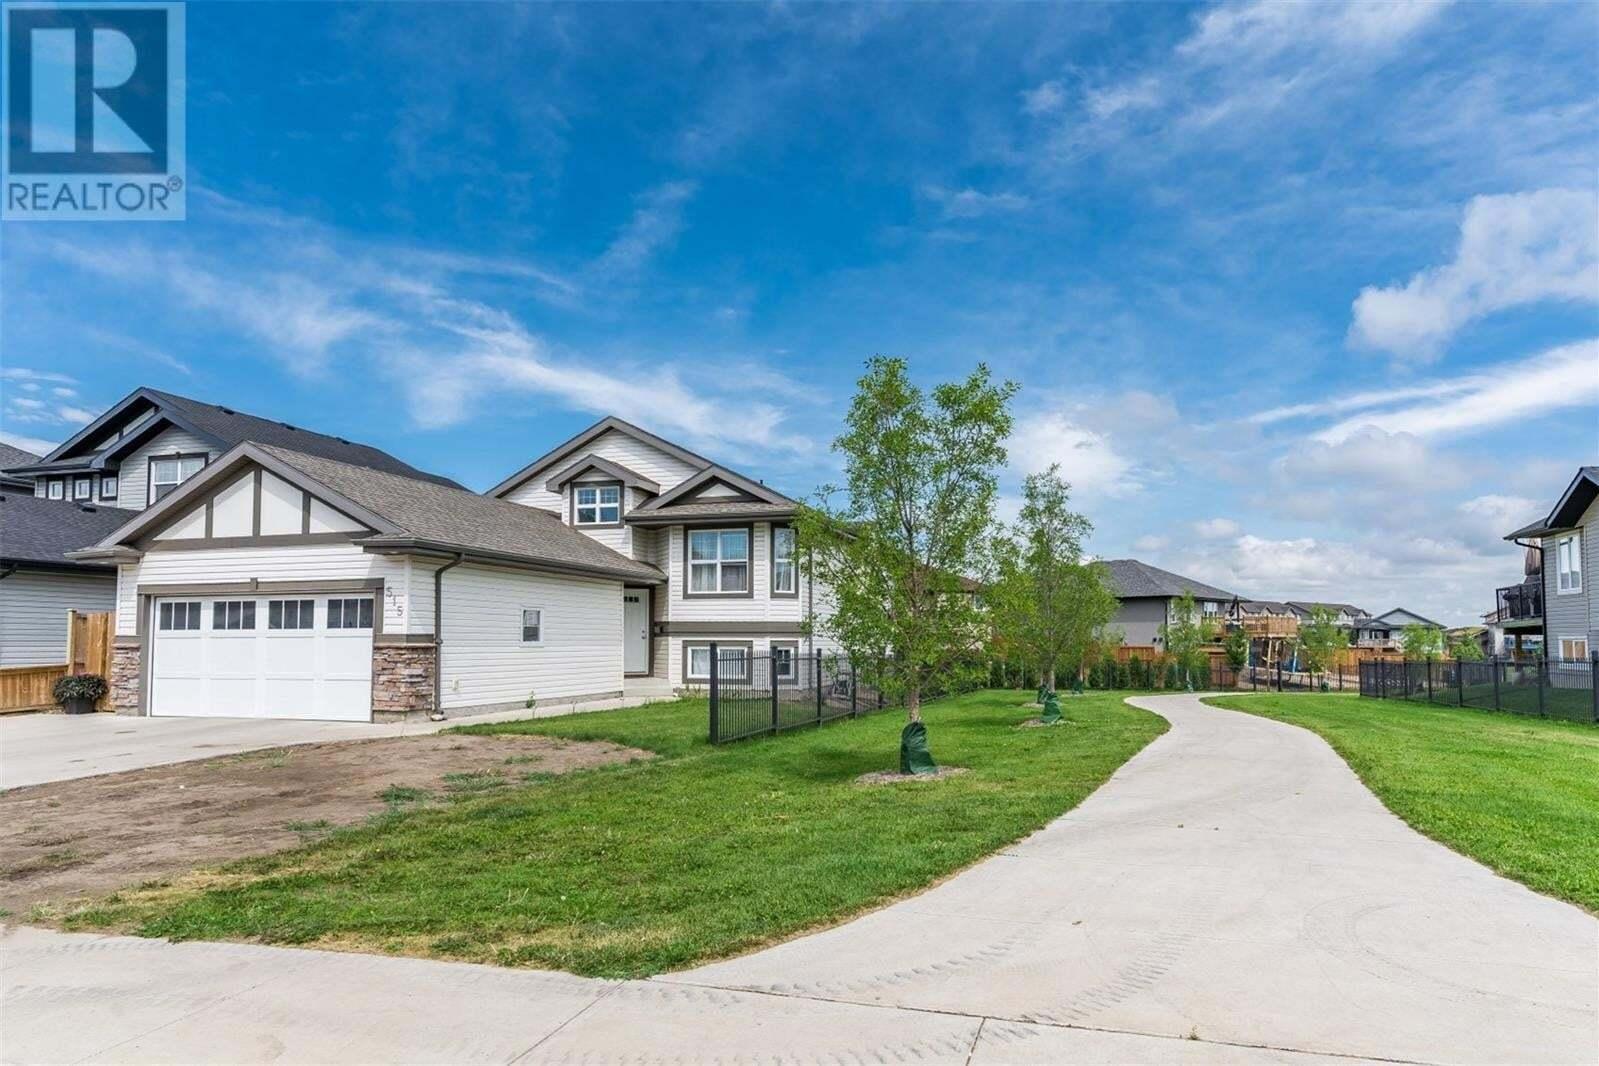 House for sale at 515 Lehrer Cres Saskatoon Saskatchewan - MLS: SK819671